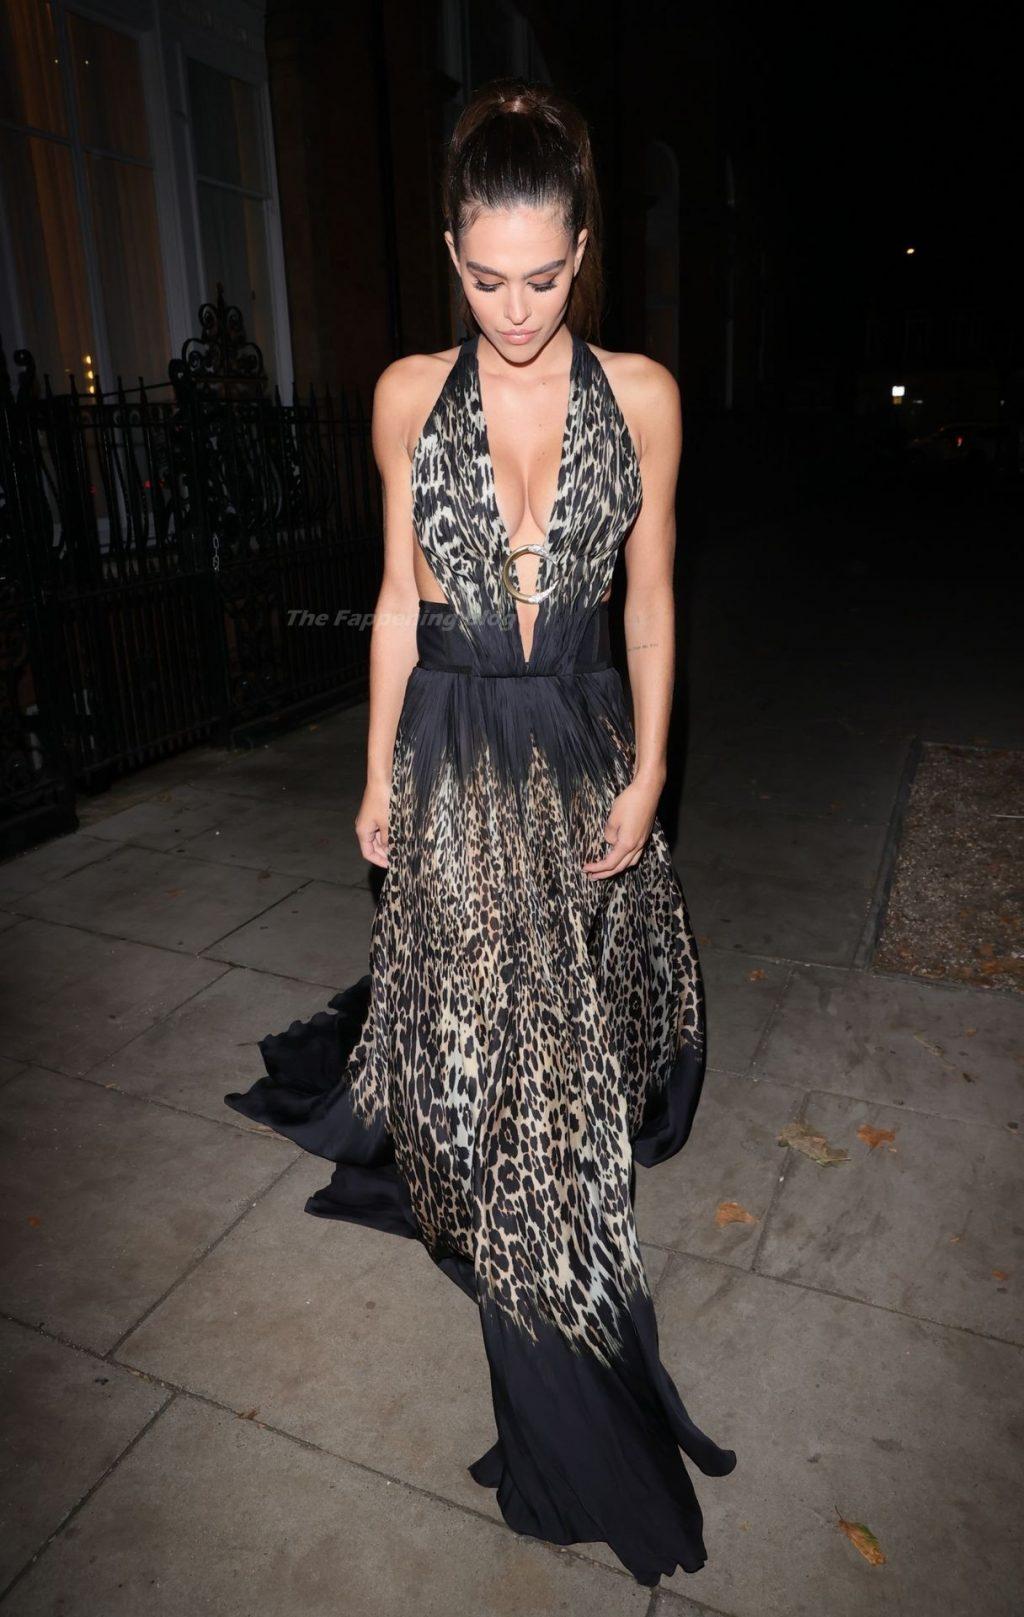 Amelia Gray Hamlin Suffers a Wardrobe Mishap Adjusting Her Split Dress at ICON Ball (43 Photos)